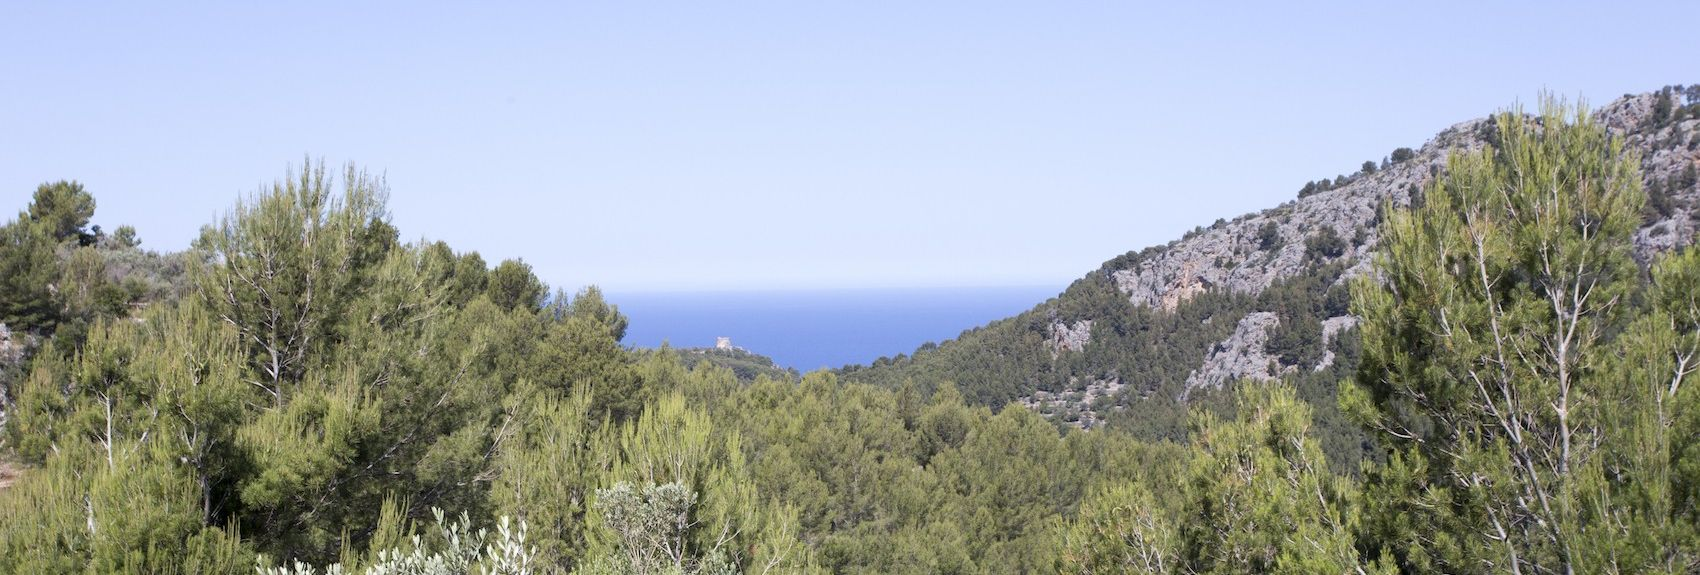 Biniaraix, Balearische Inseln, Spanien